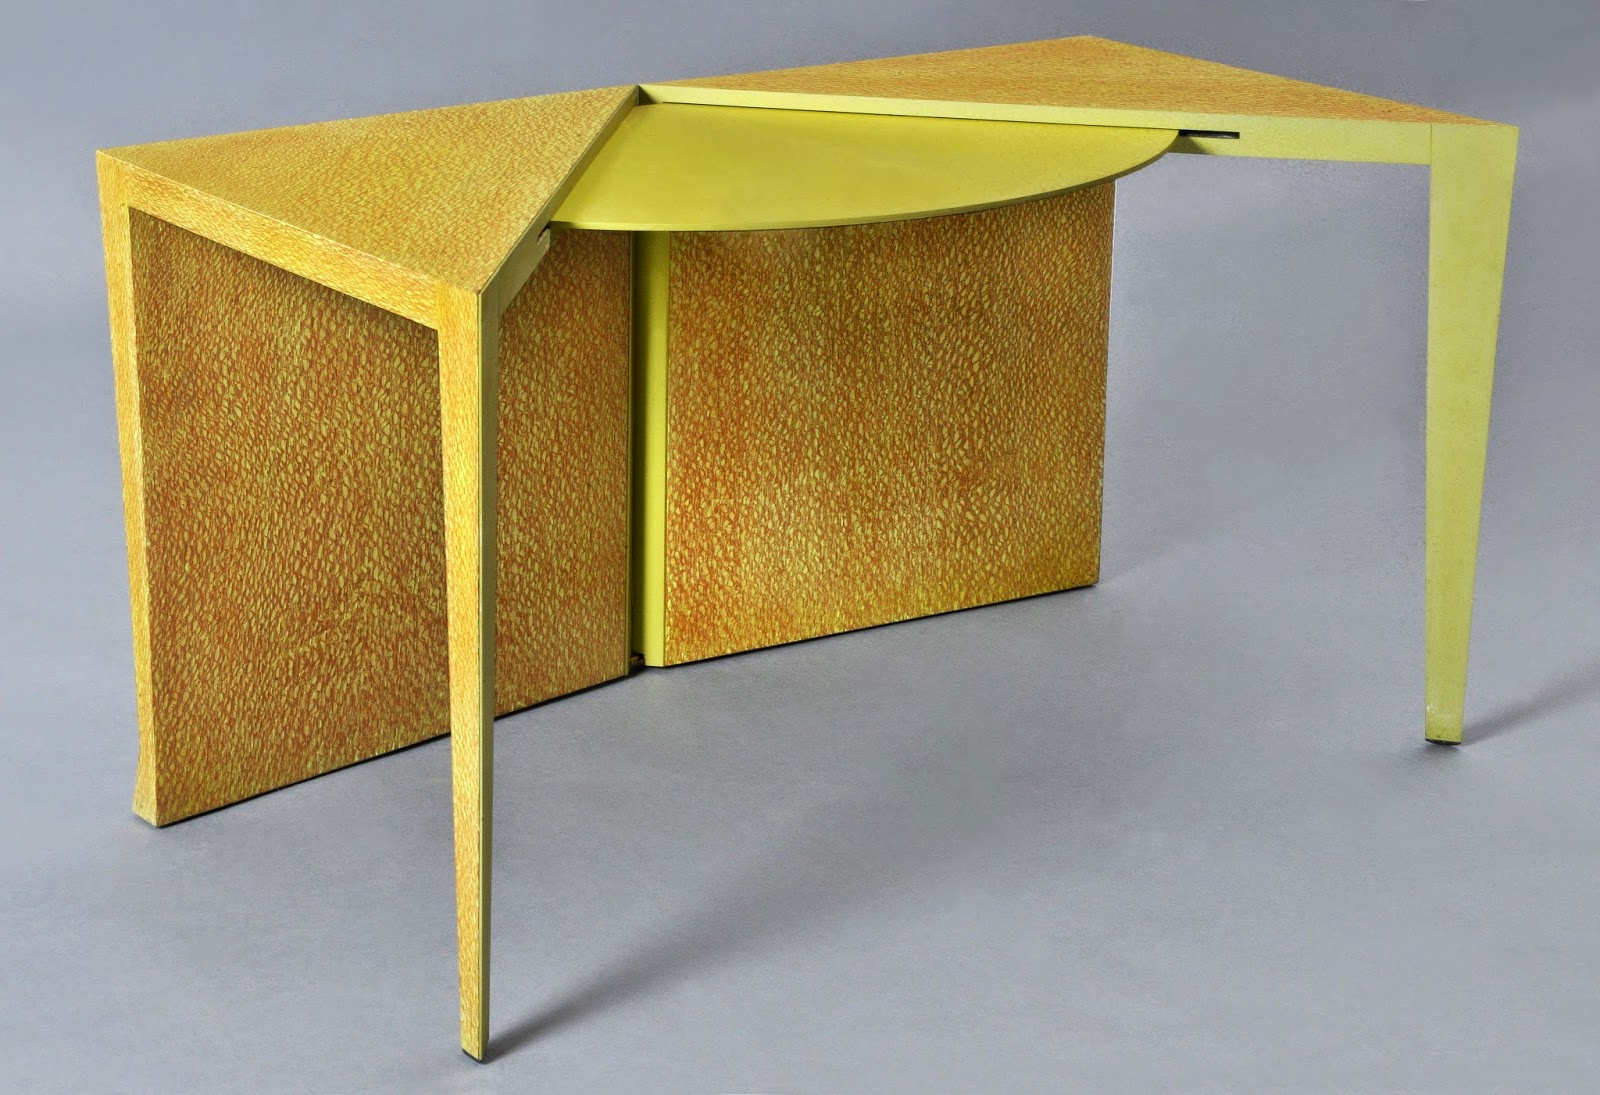 blog de phaco expo a tables avec le mobilier national. Black Bedroom Furniture Sets. Home Design Ideas